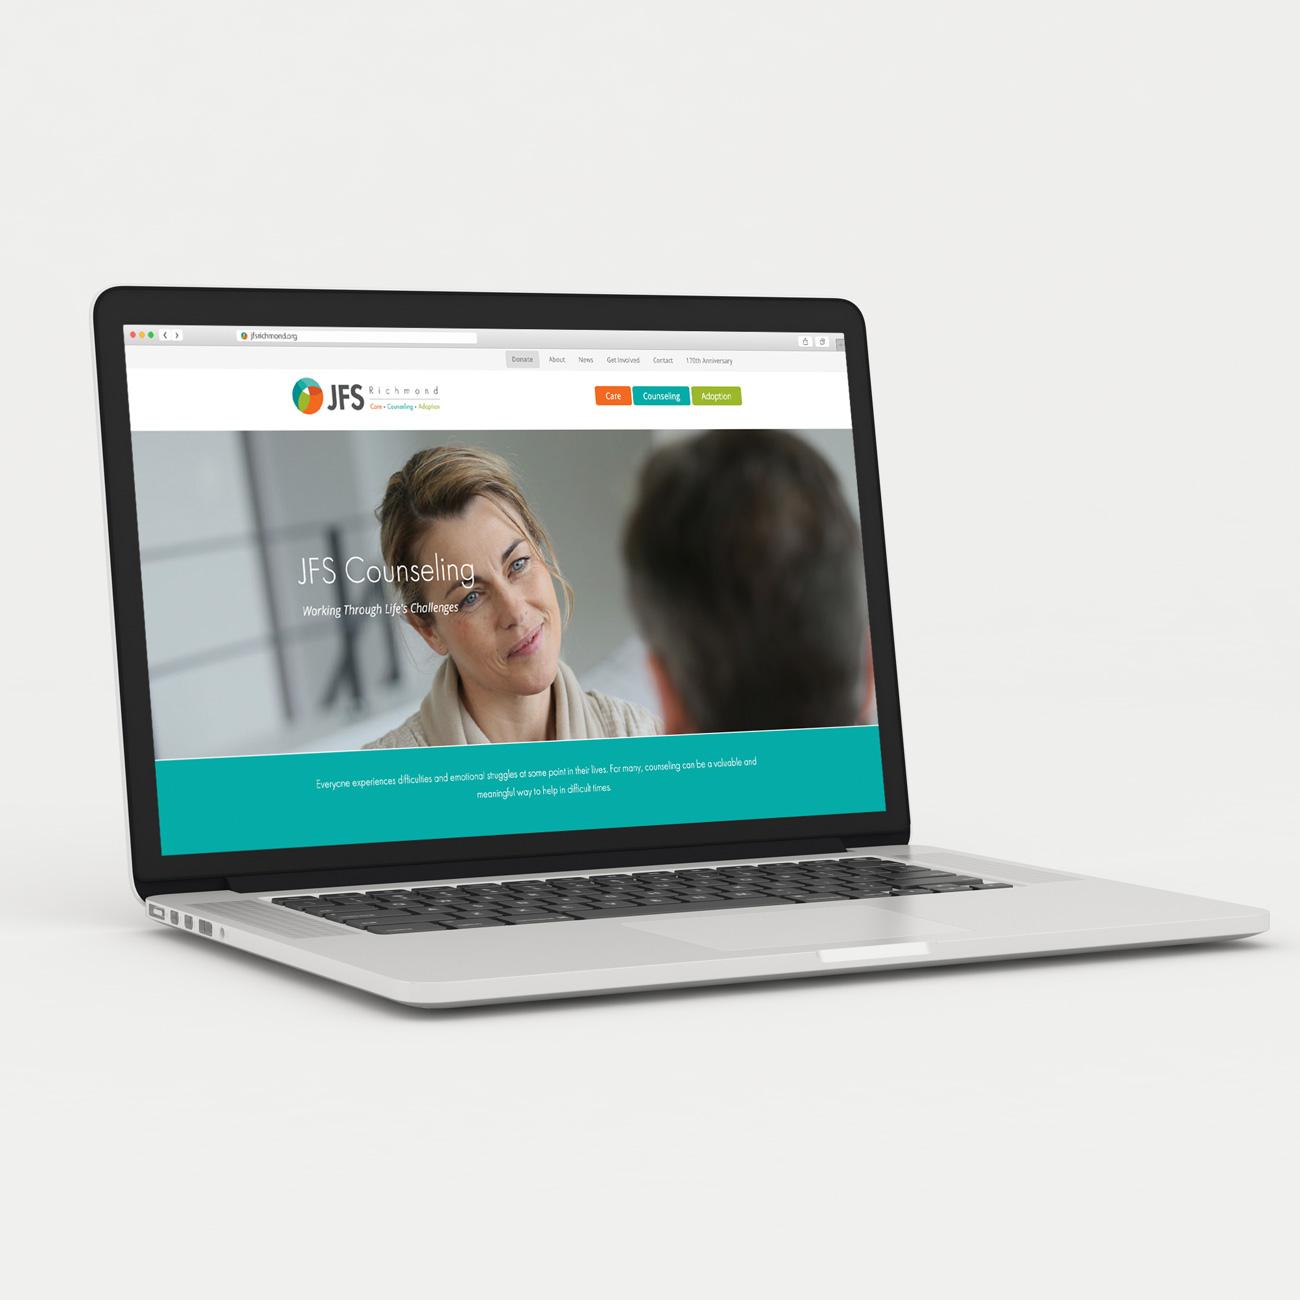 JFS Website on laptop